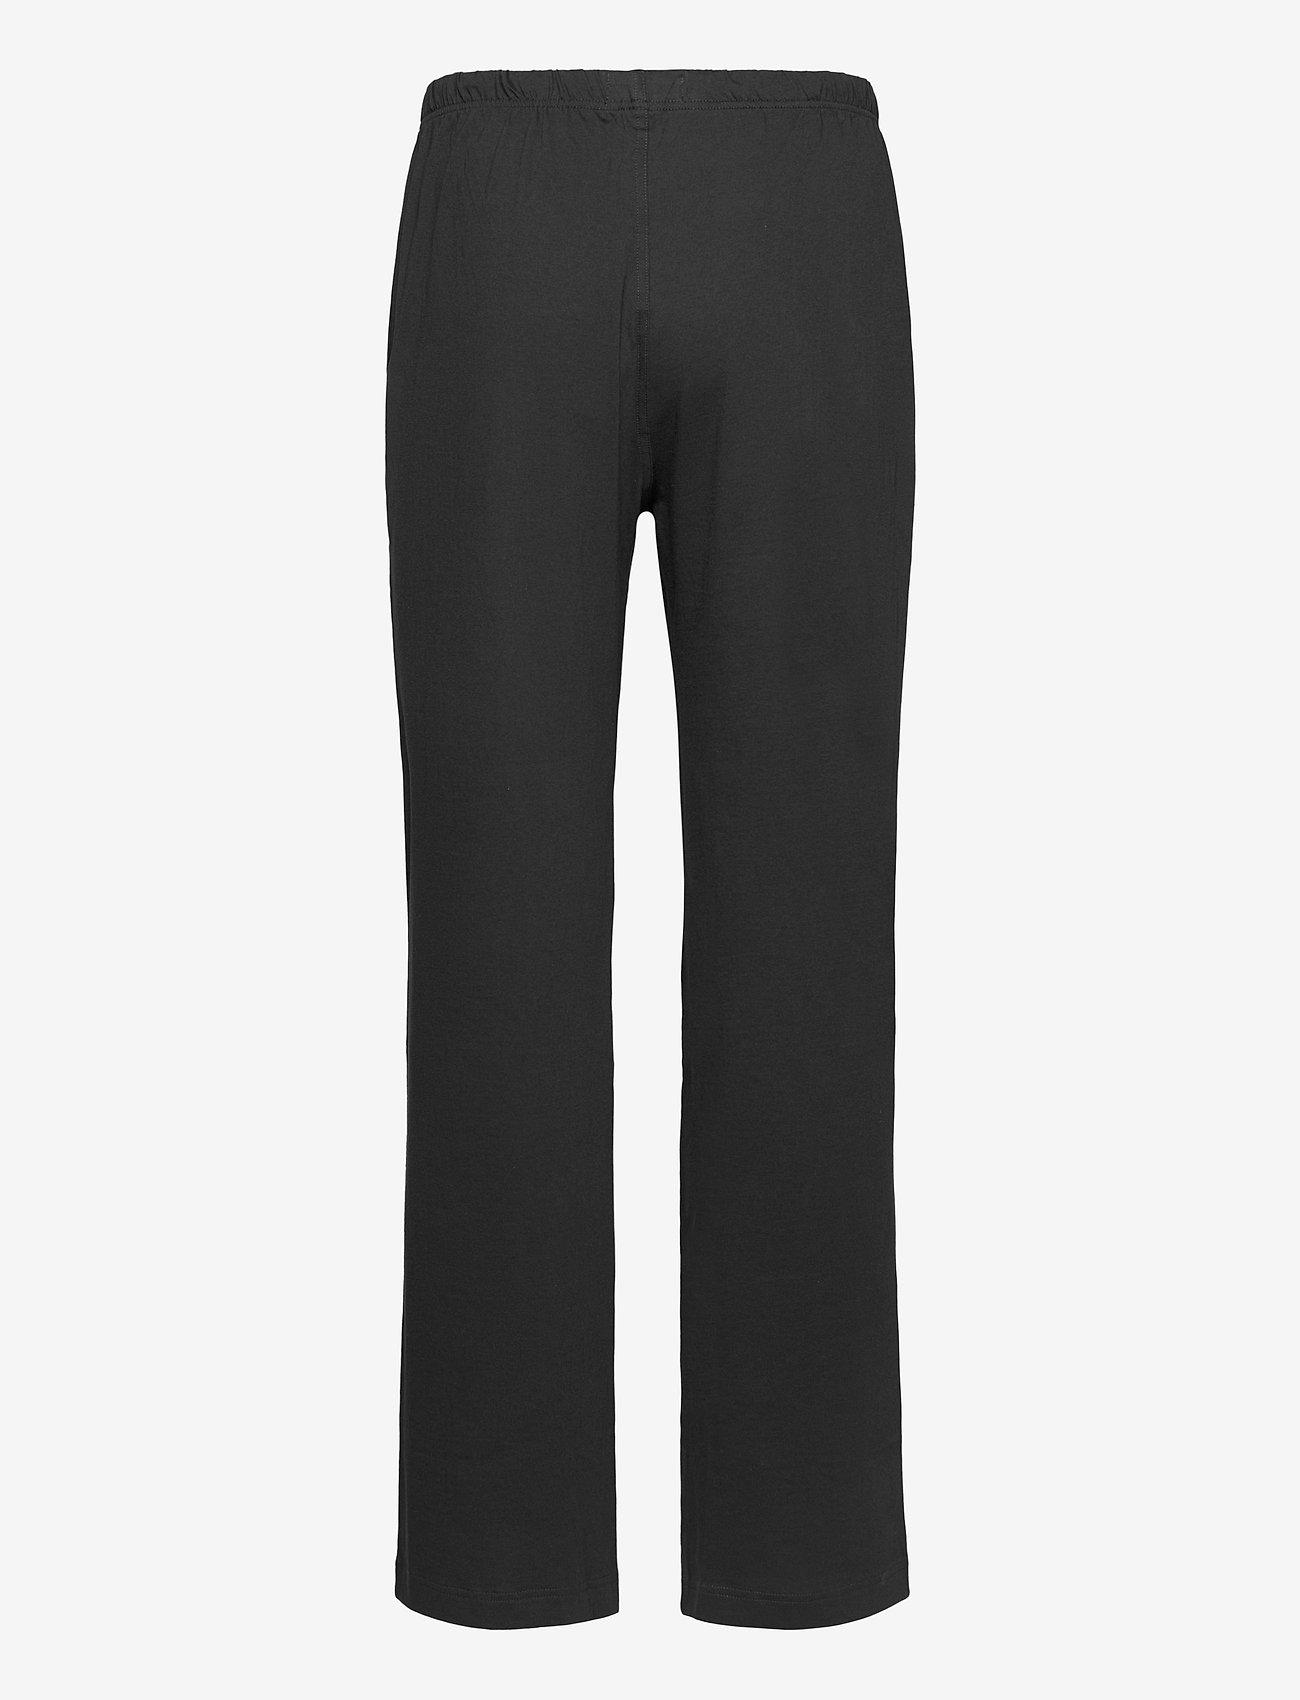 Polo Ralph Lauren Underwear - LIQUID COTTON-SPN-SLB - bottoms - polo black - 1